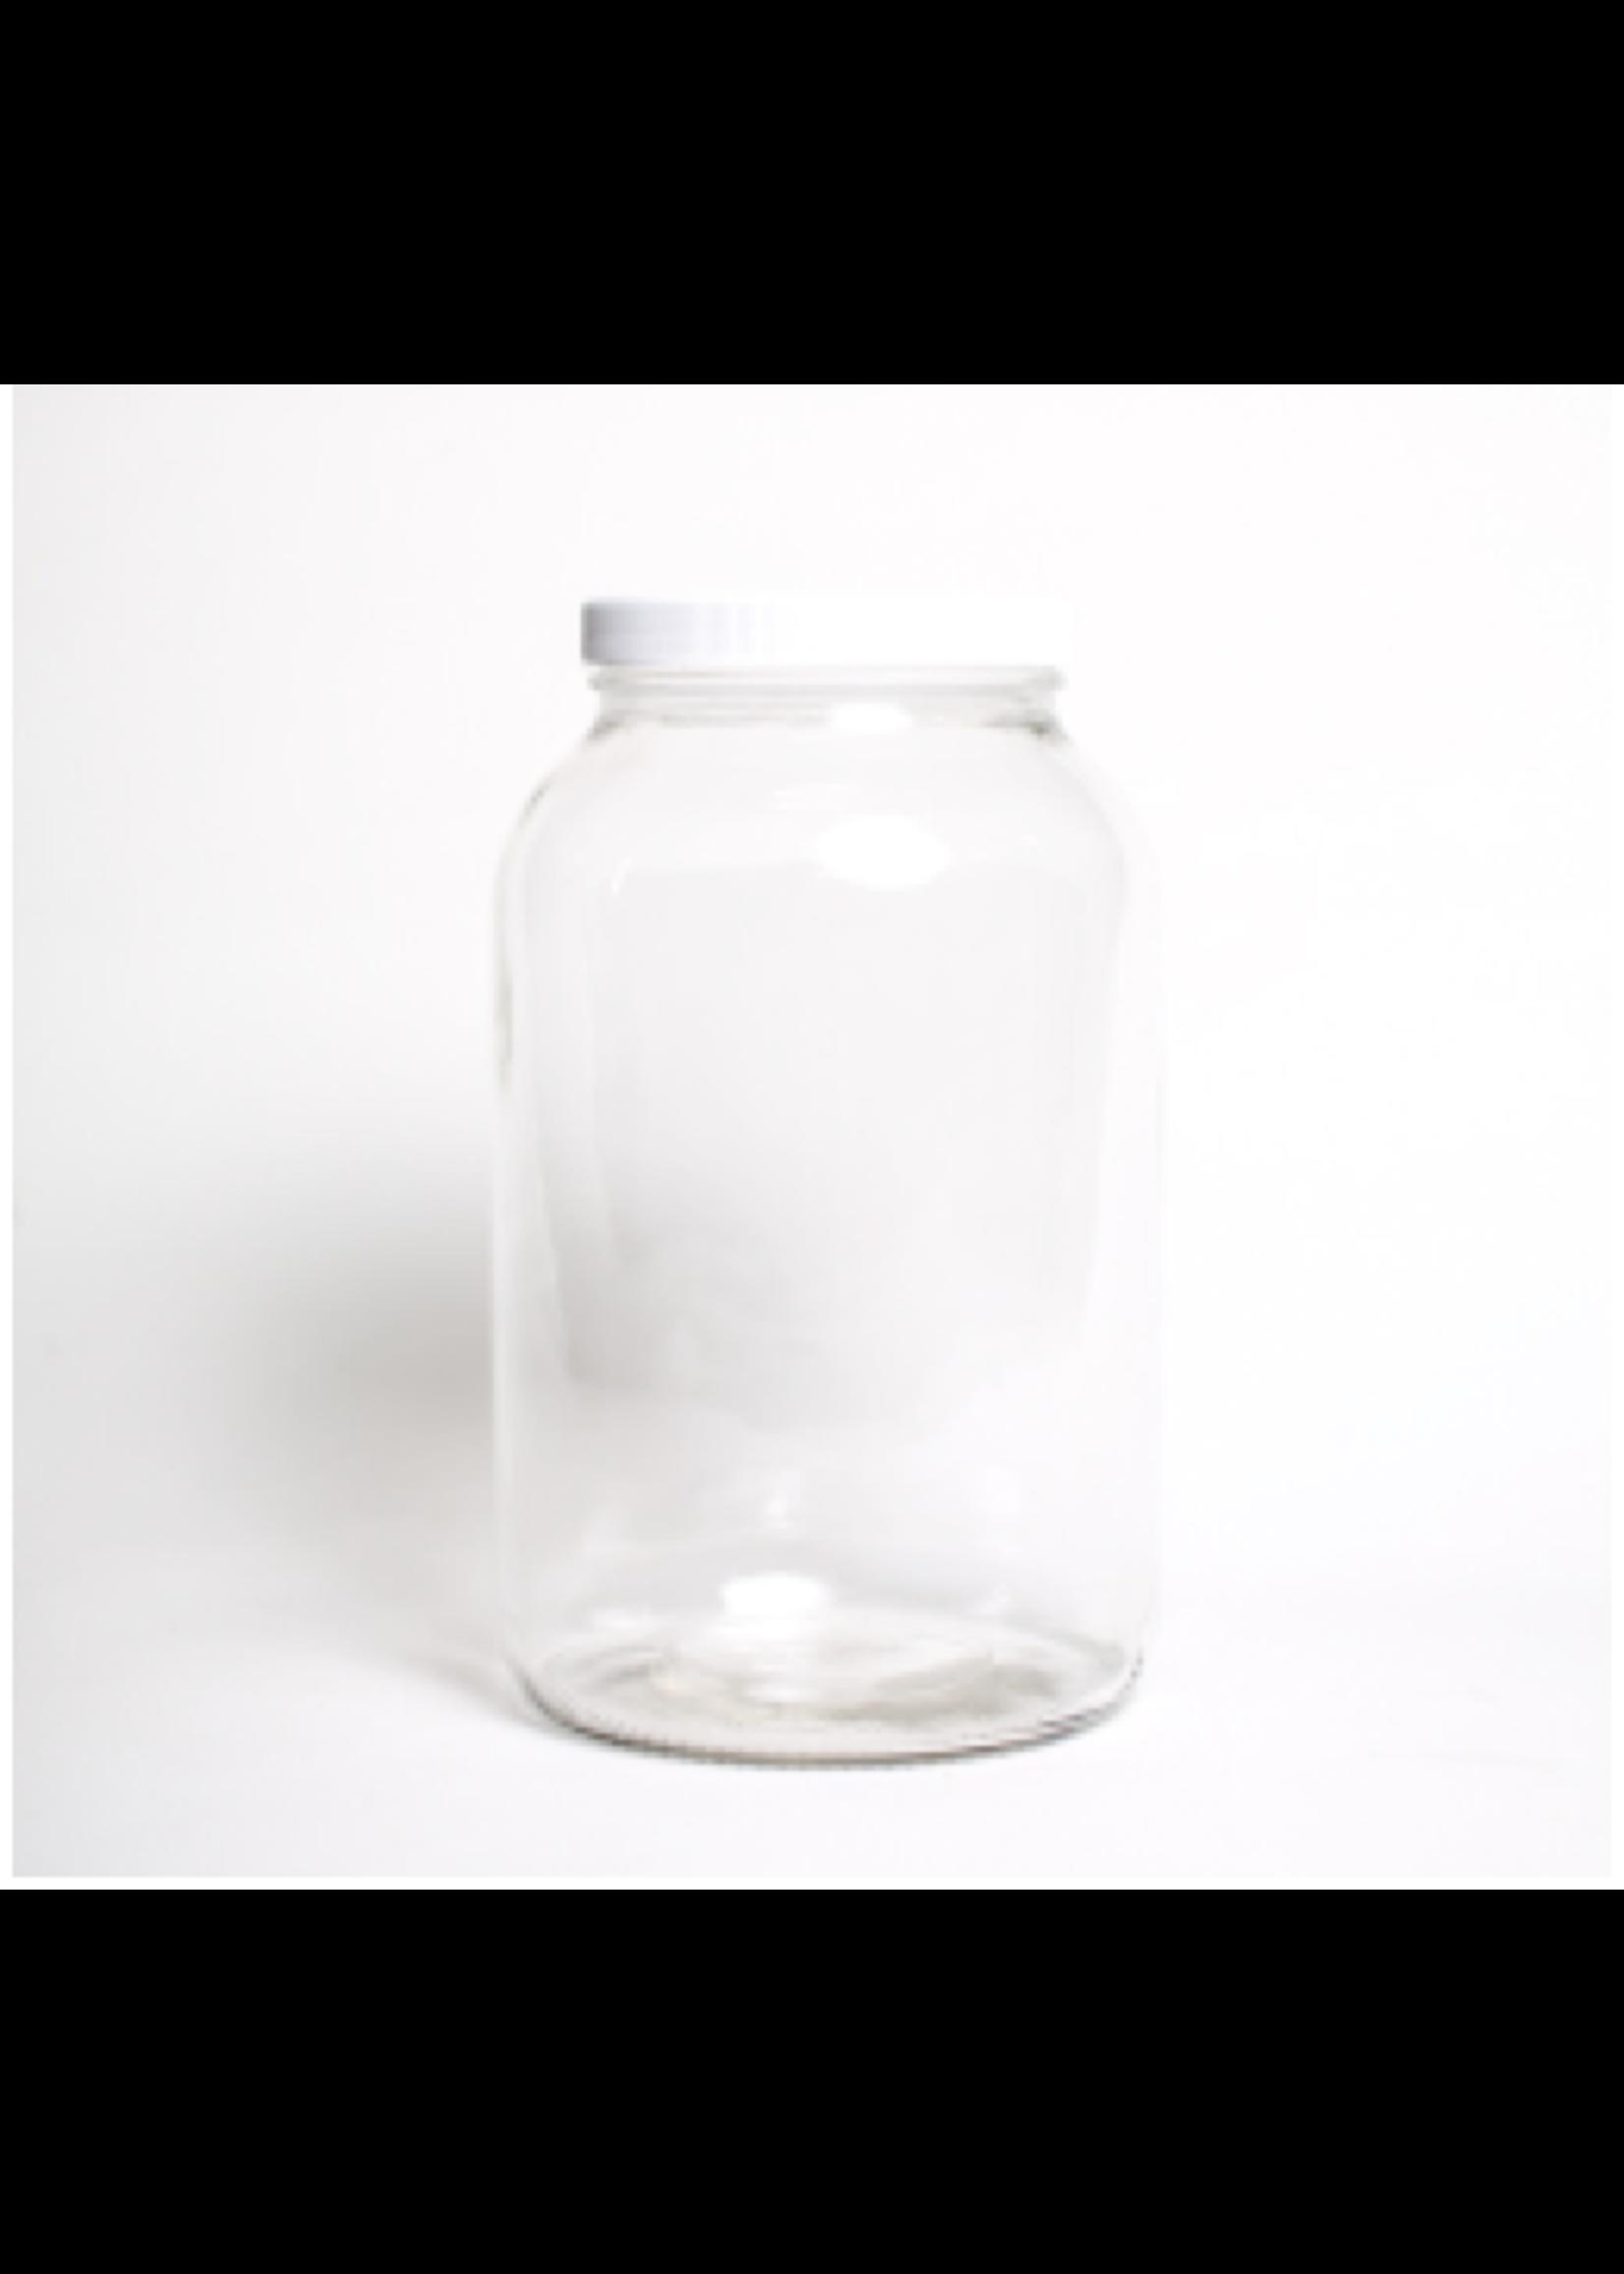 Fermentation One Gallon Fermentation Glass Jar w/ Plastic Lid